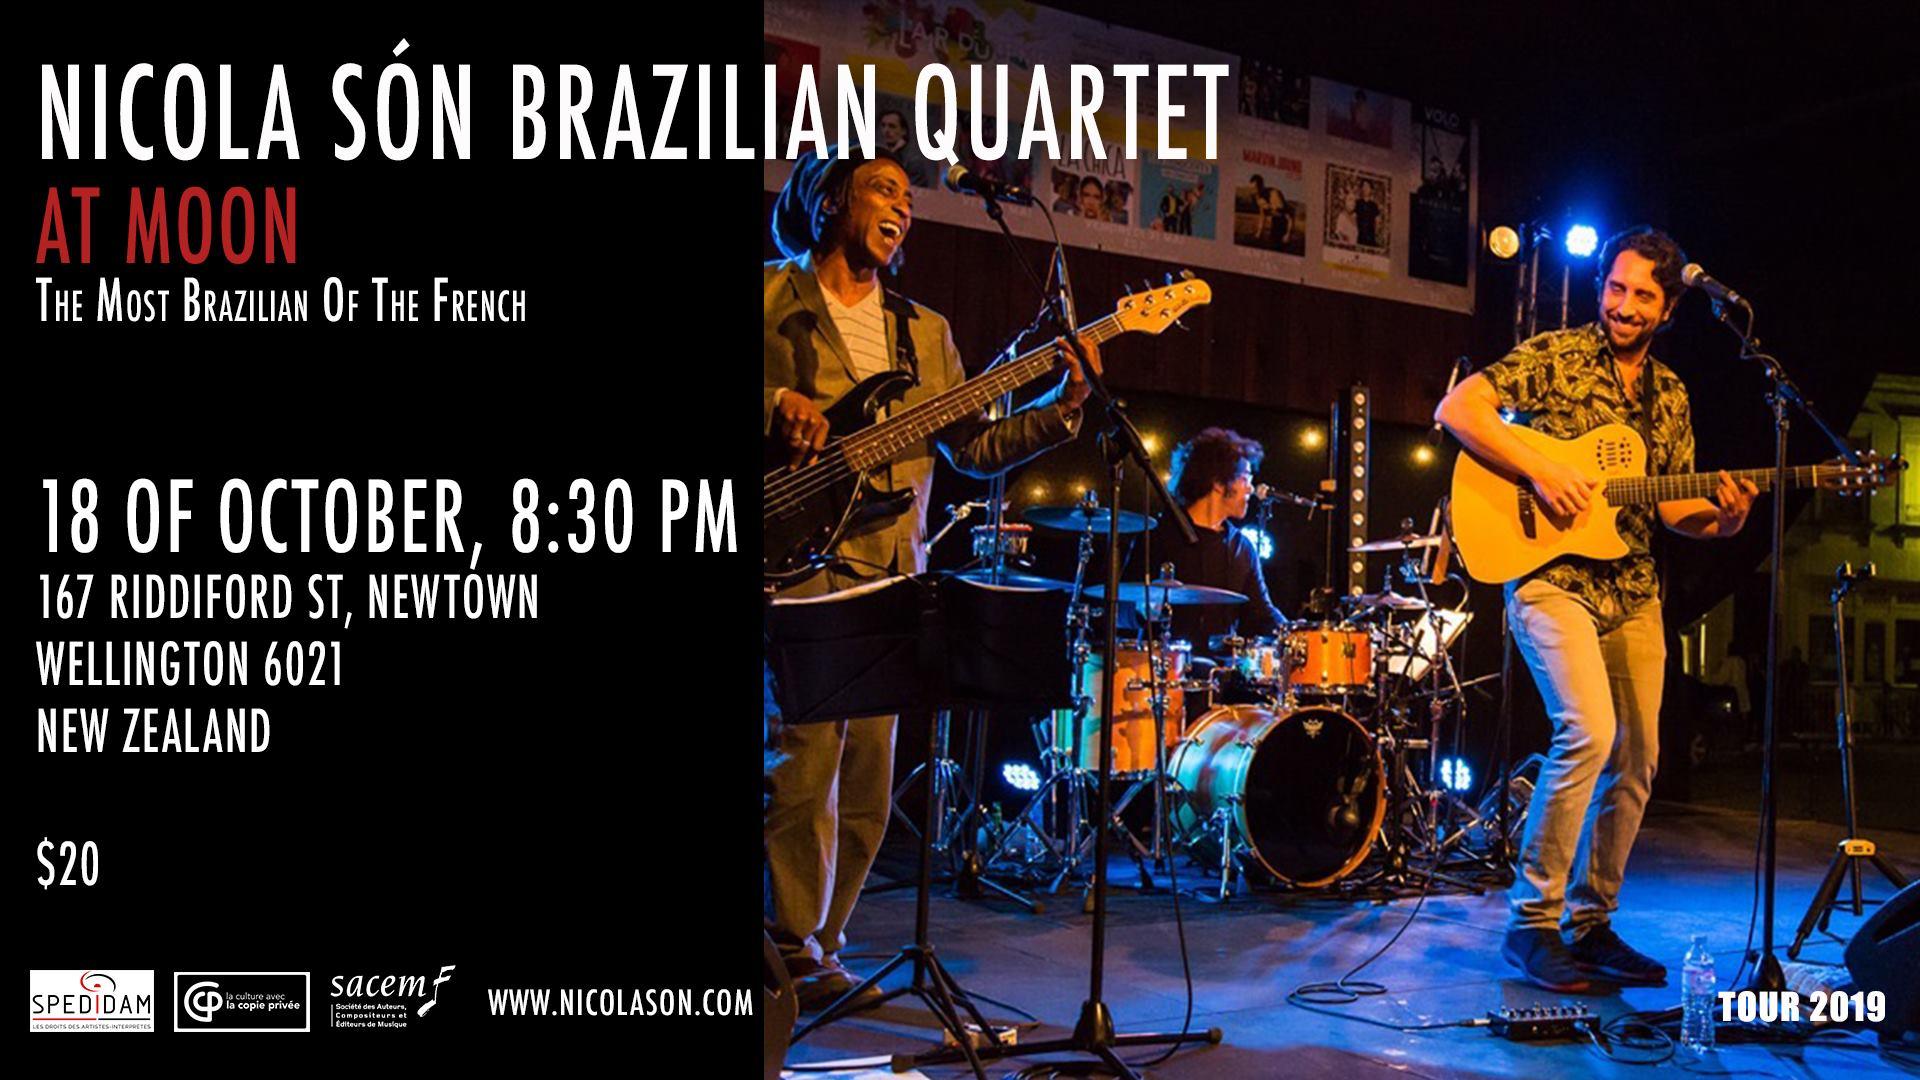 Nicola Son Brazilian Quartet